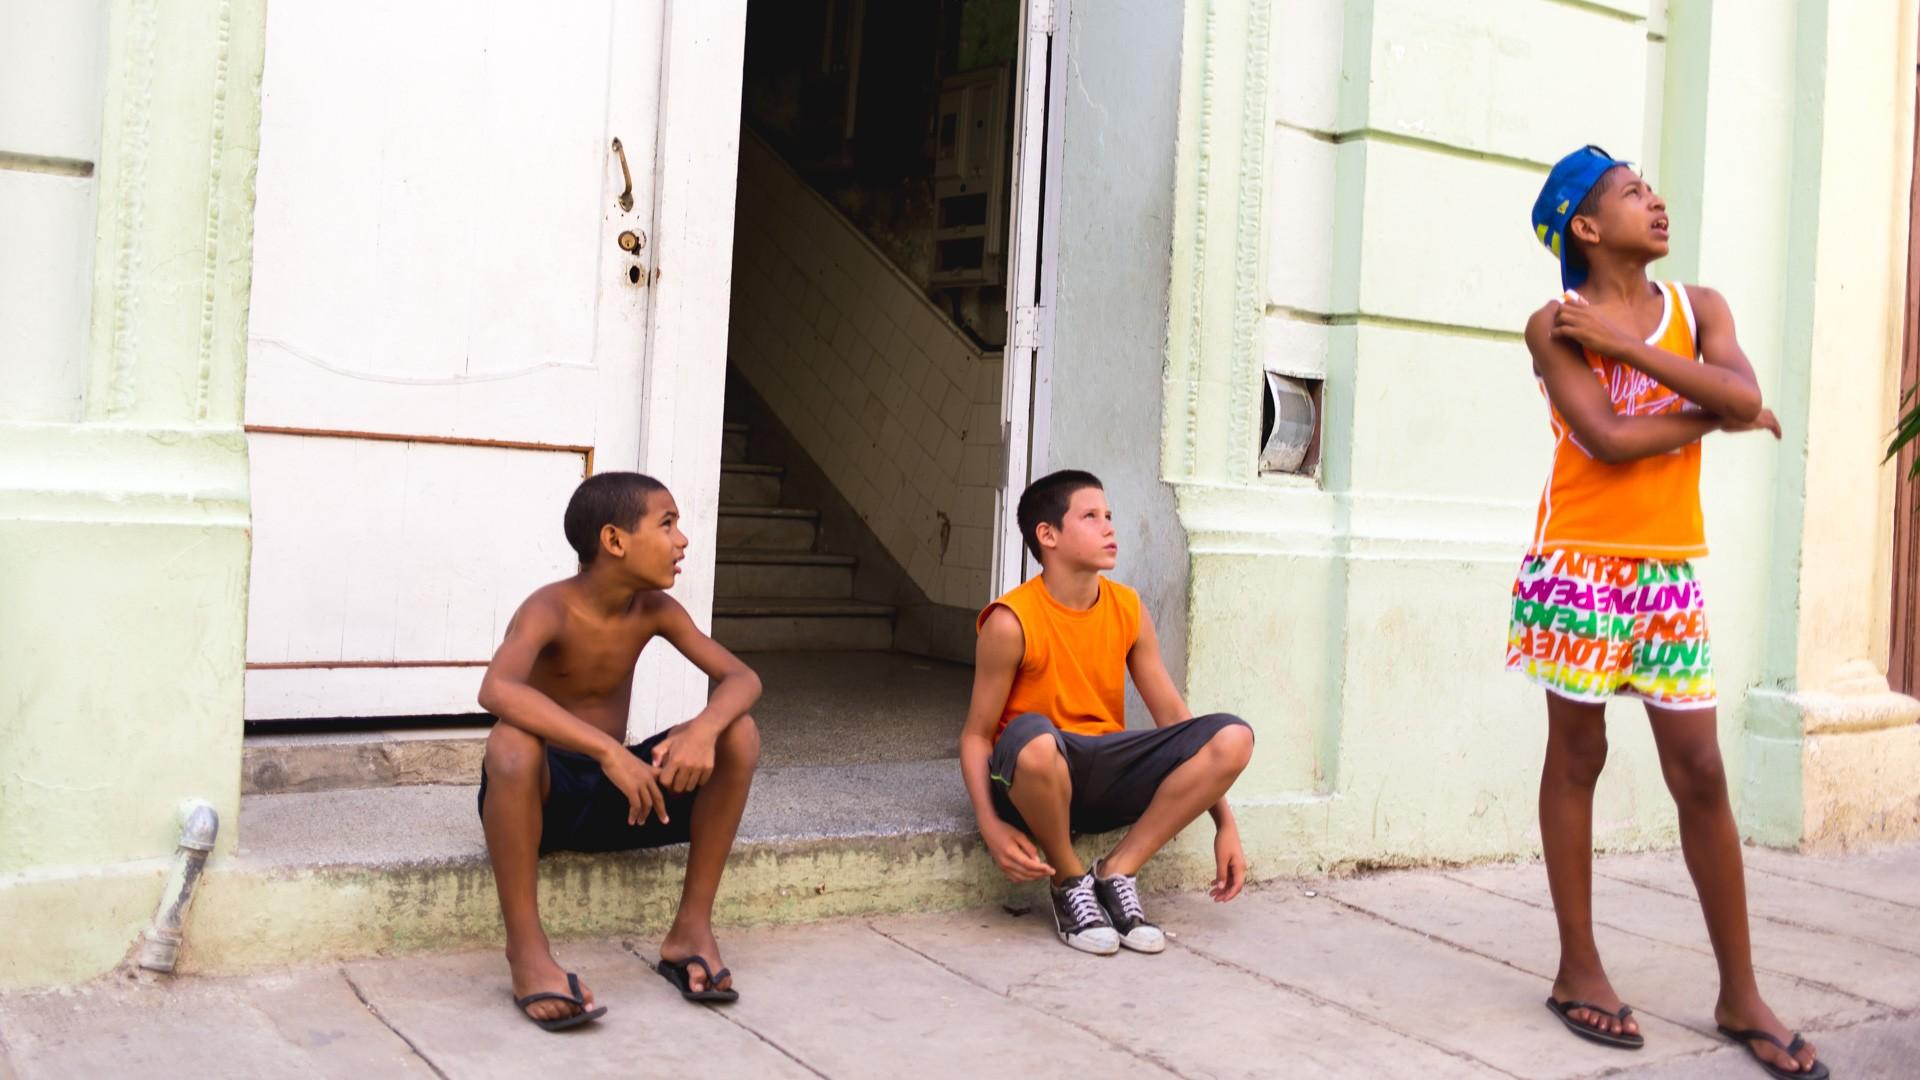 Damien-Dohmen-Photographe-Cuba-5